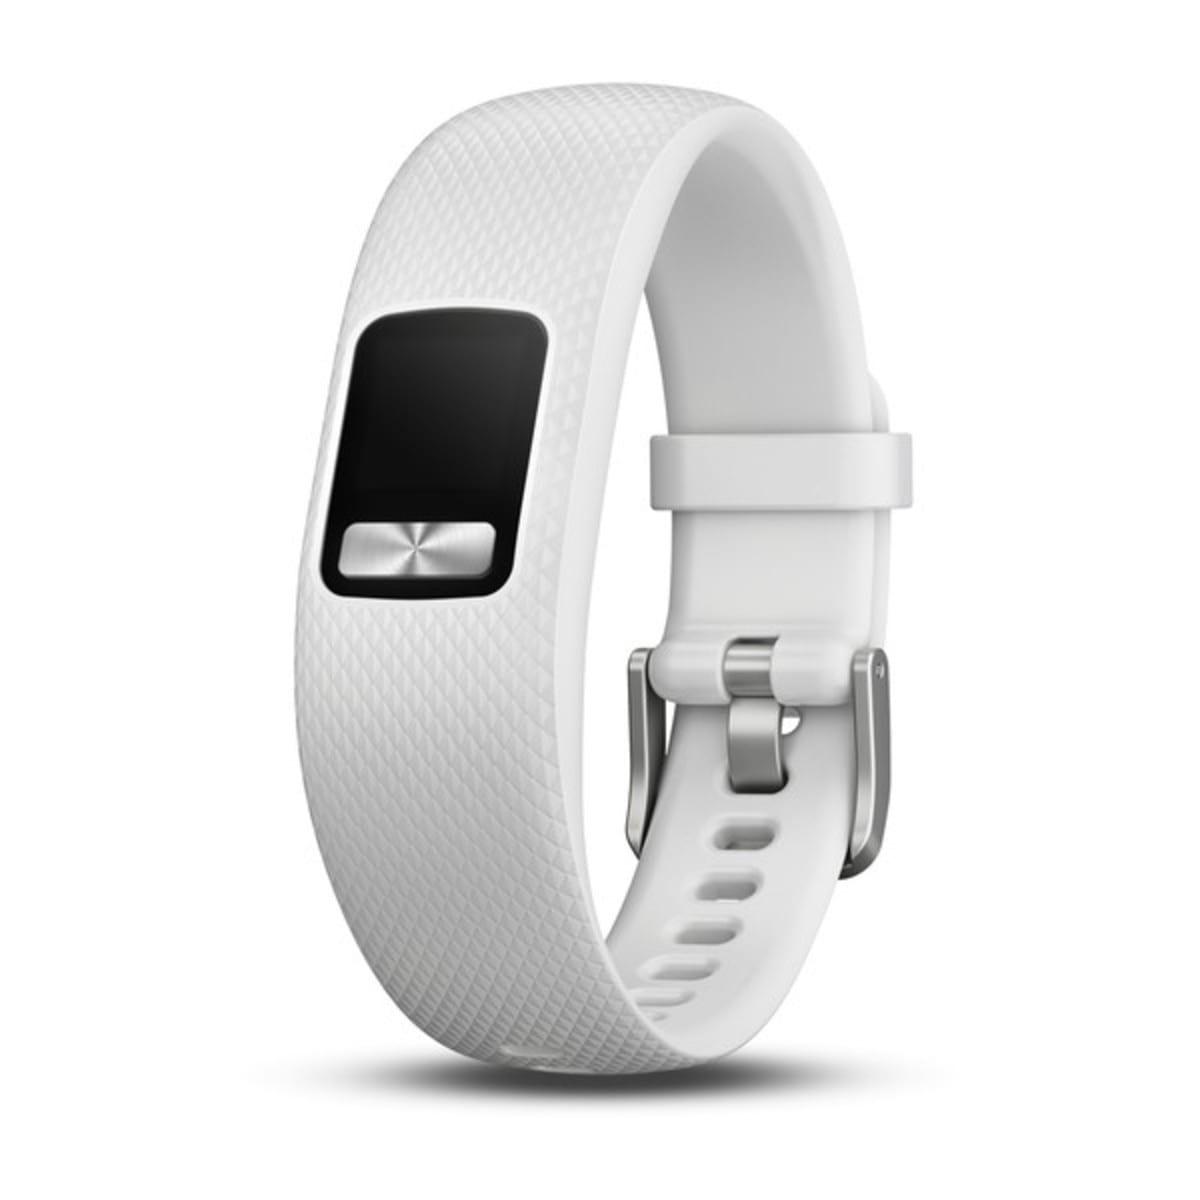 Garmin Ersatz-/Wechselarmband »Ersatzarmband Vivofit 4 (S/M)« | Schmuck > Armbänder > Sonstige Armbänder | Weiß | GARMIN